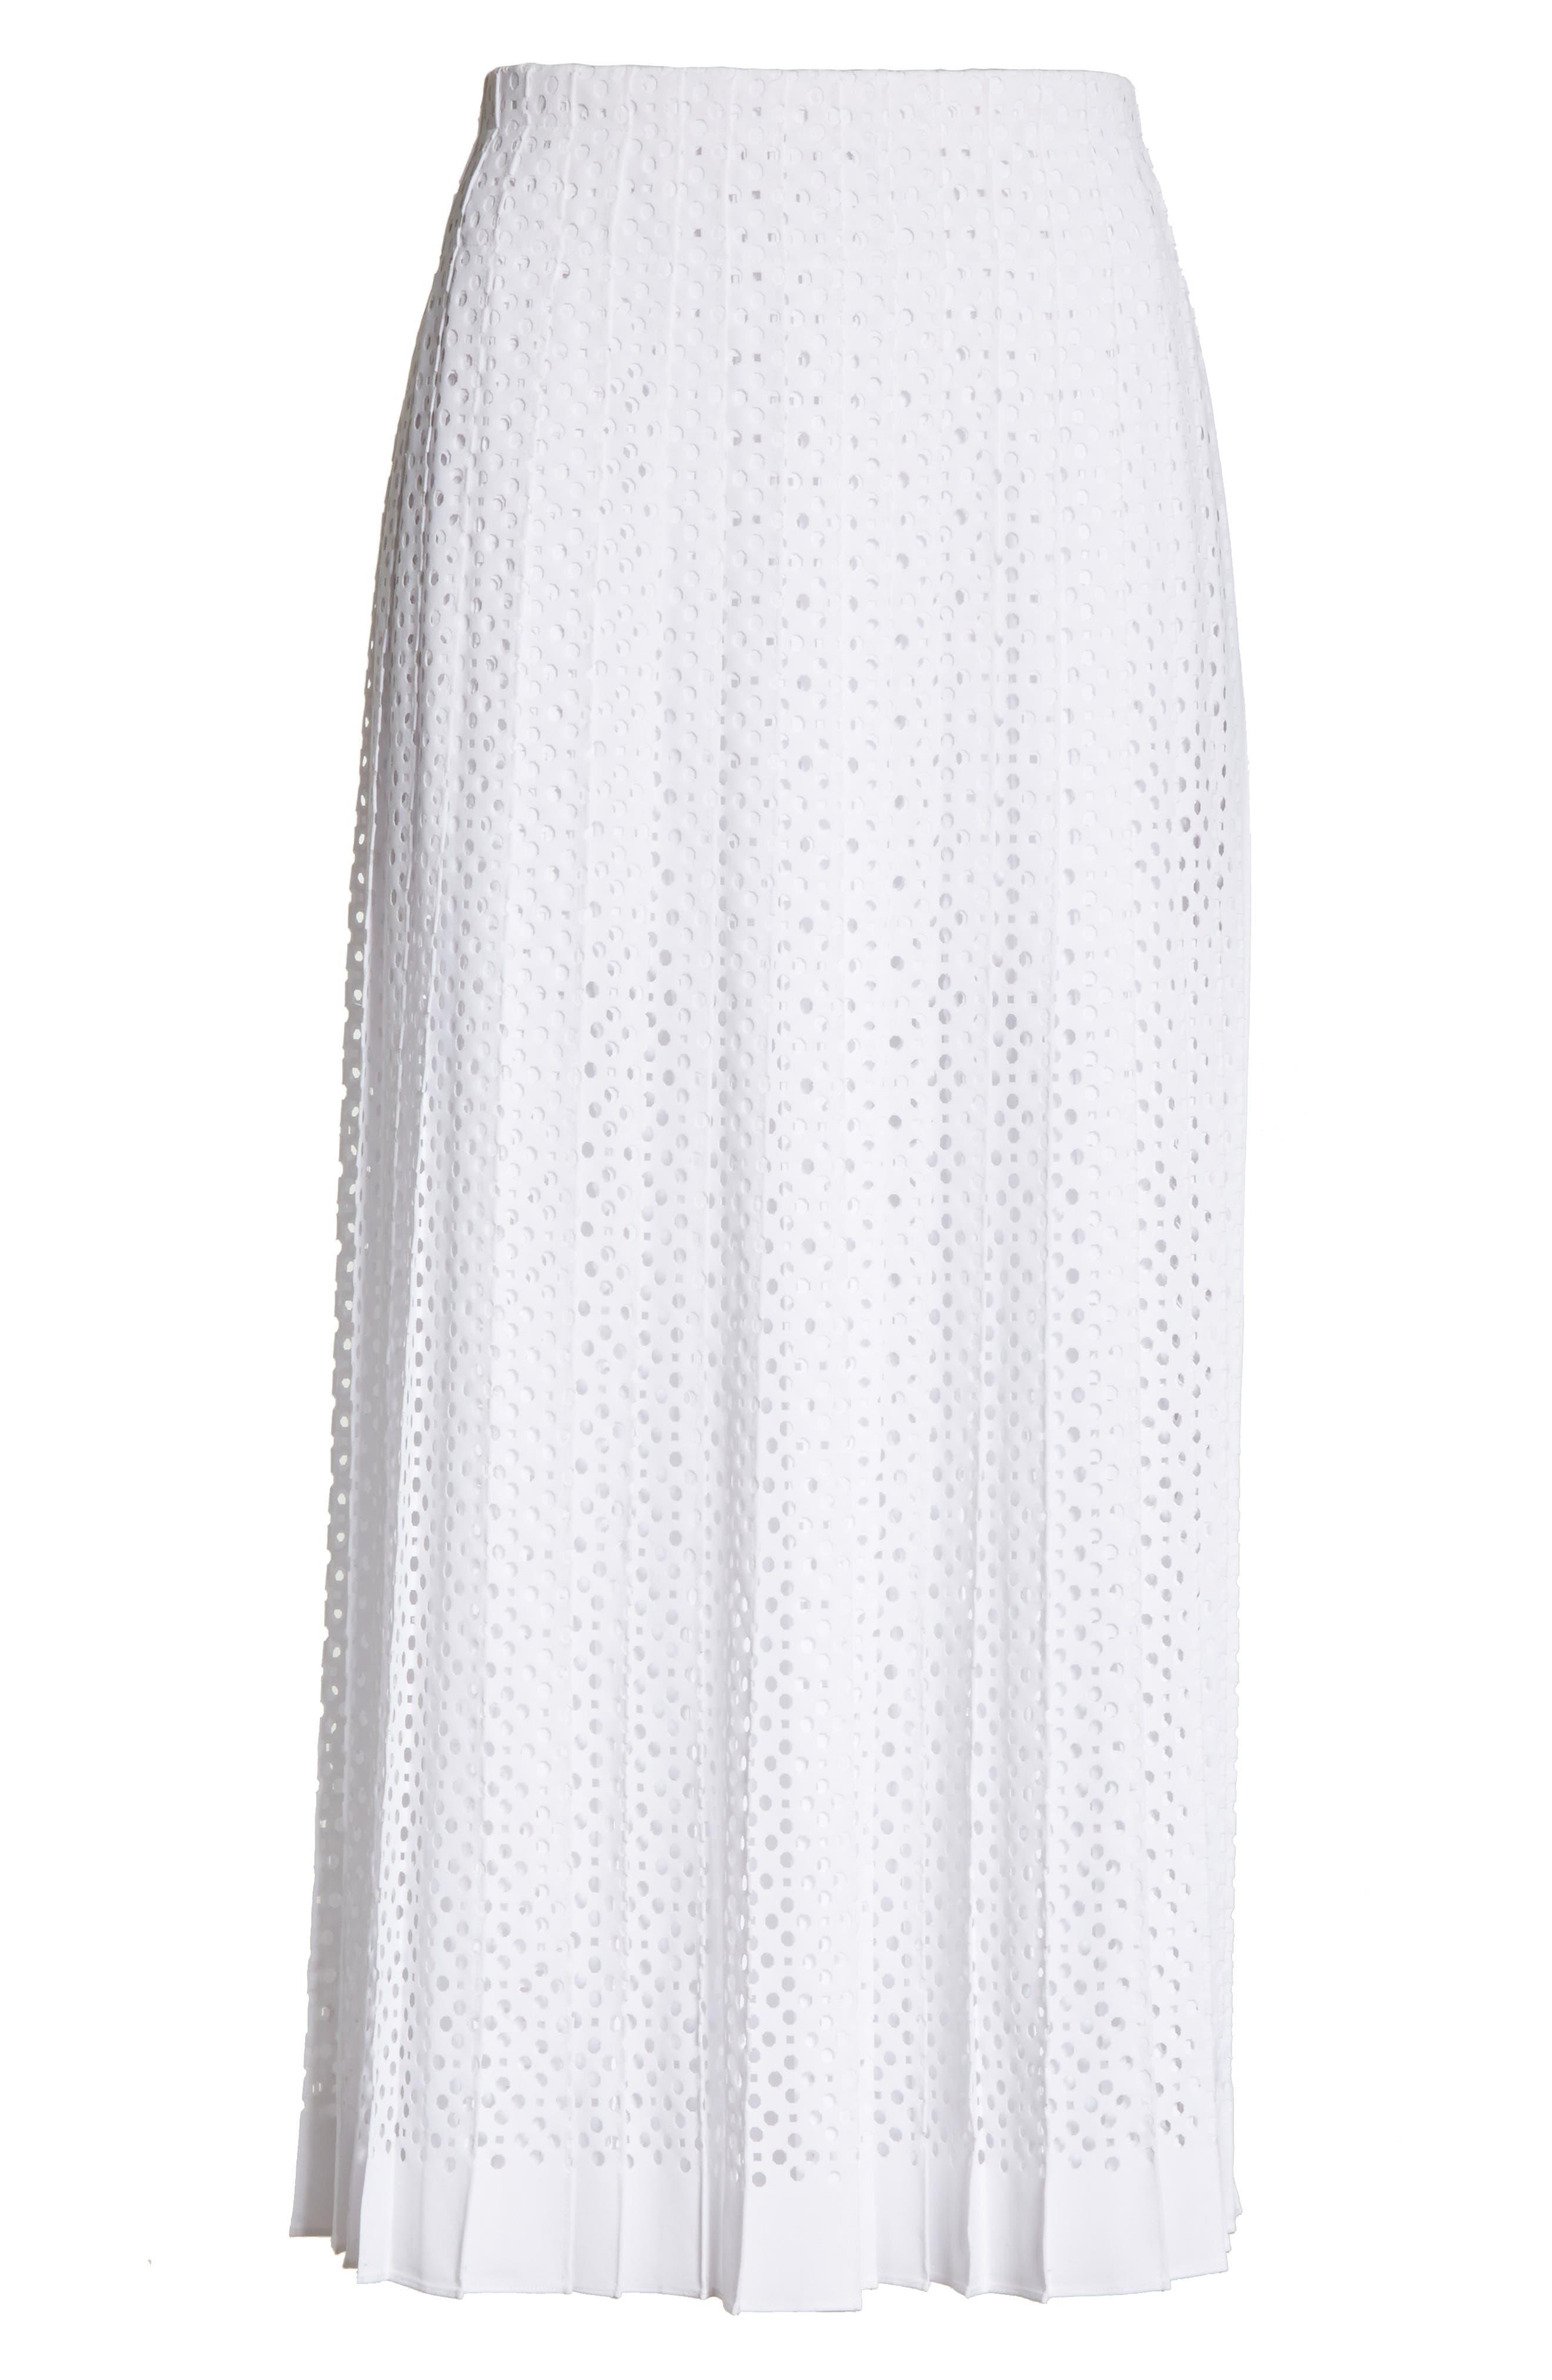 TORY BURCH,                             Carine Eyelet Midi Skirt,                             Alternate thumbnail 6, color,                             100